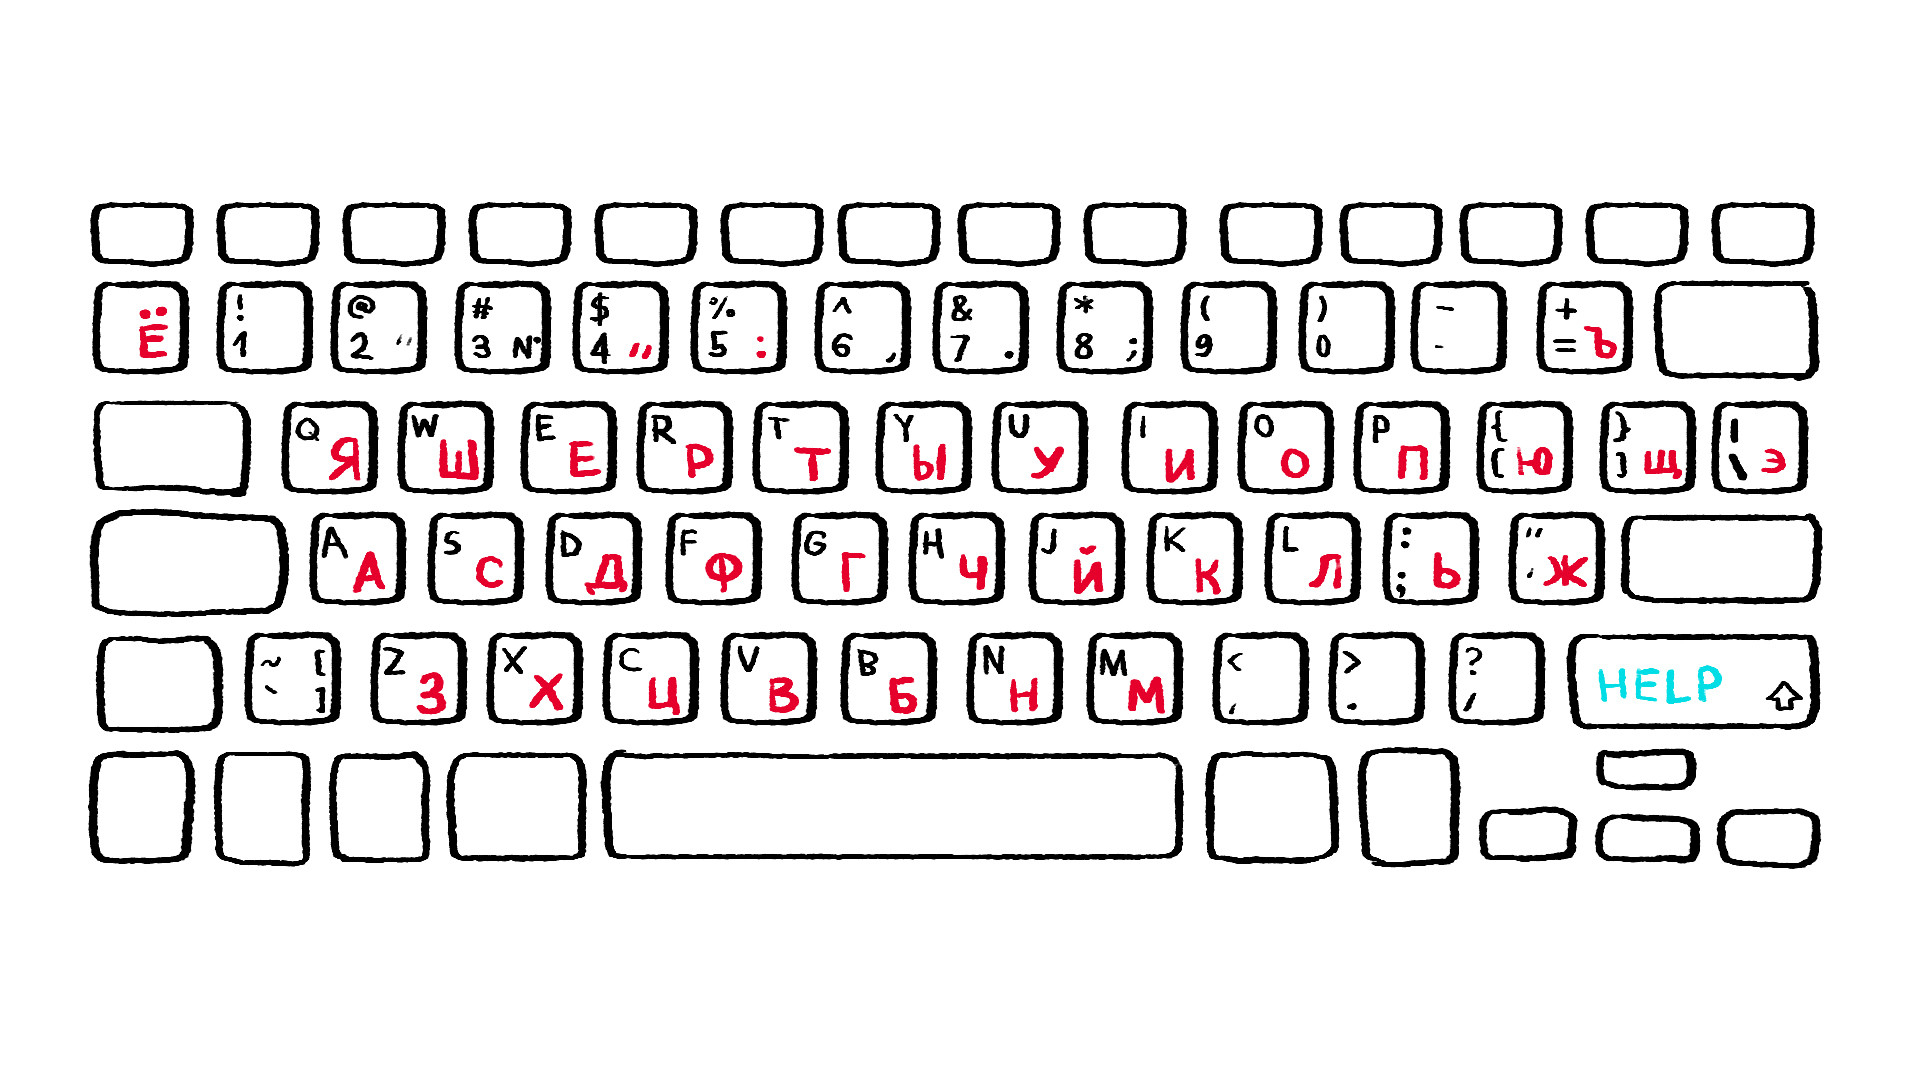 Russian Cursive Alphabet Keyboard